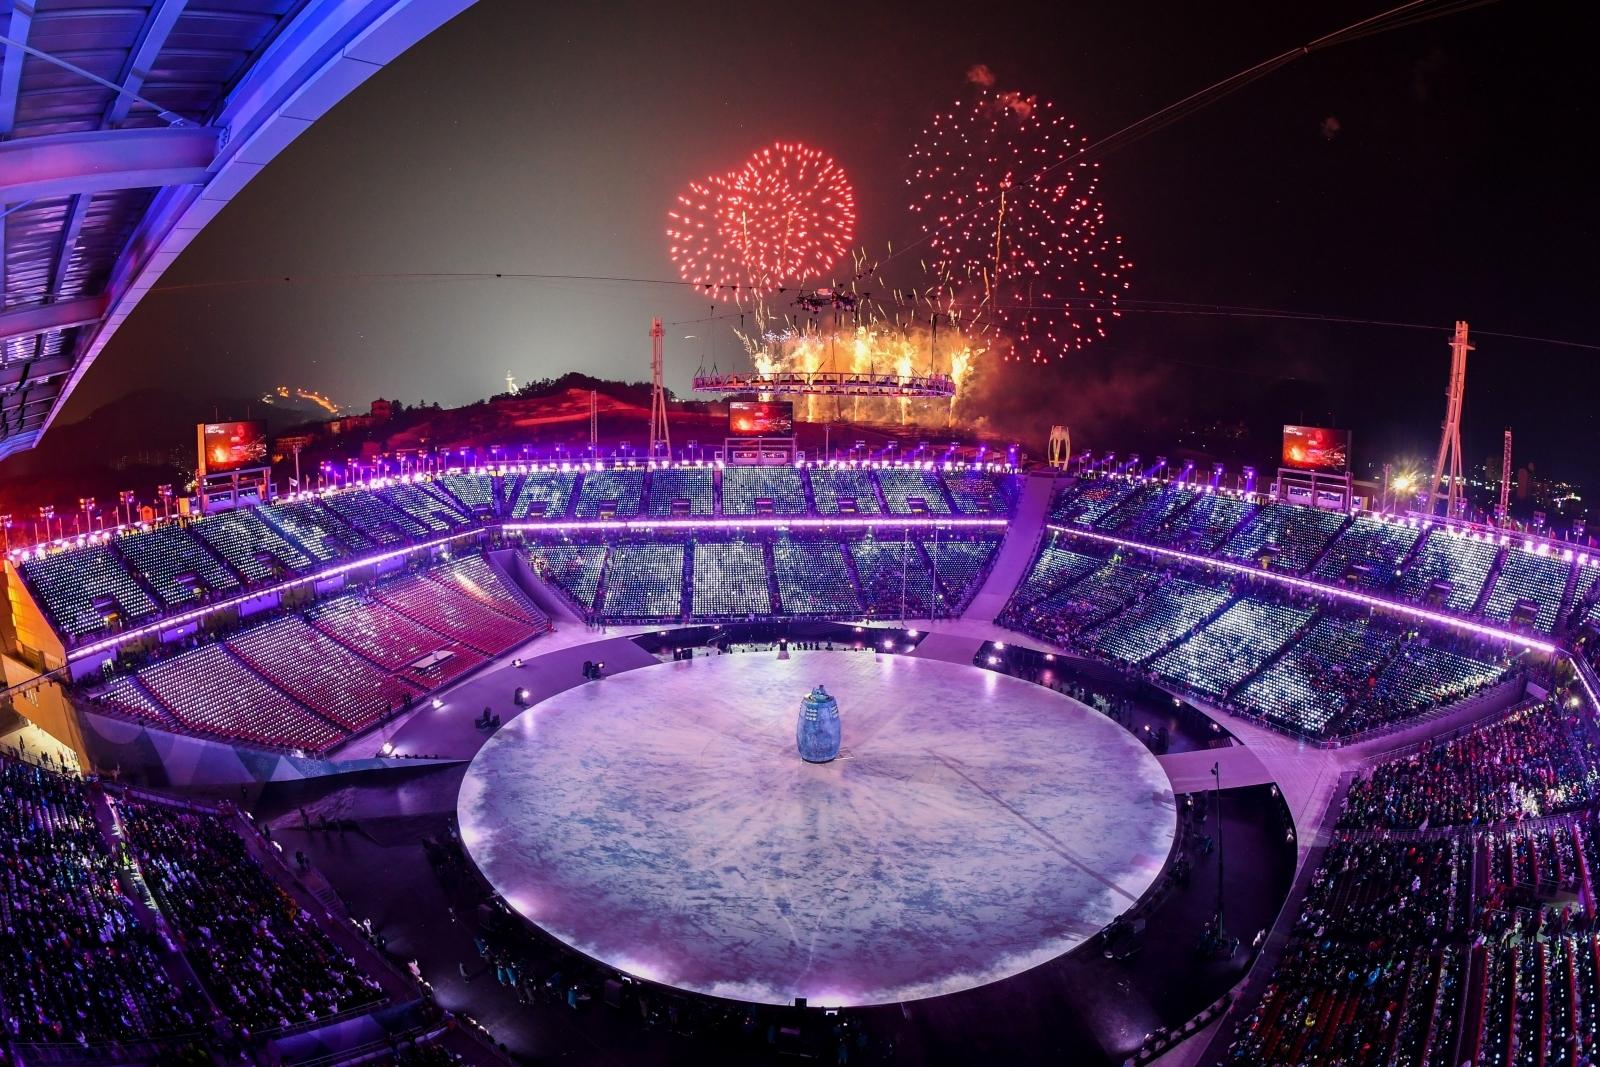 Pyeongchang 2018 Winter Olympics Opening Ceremony